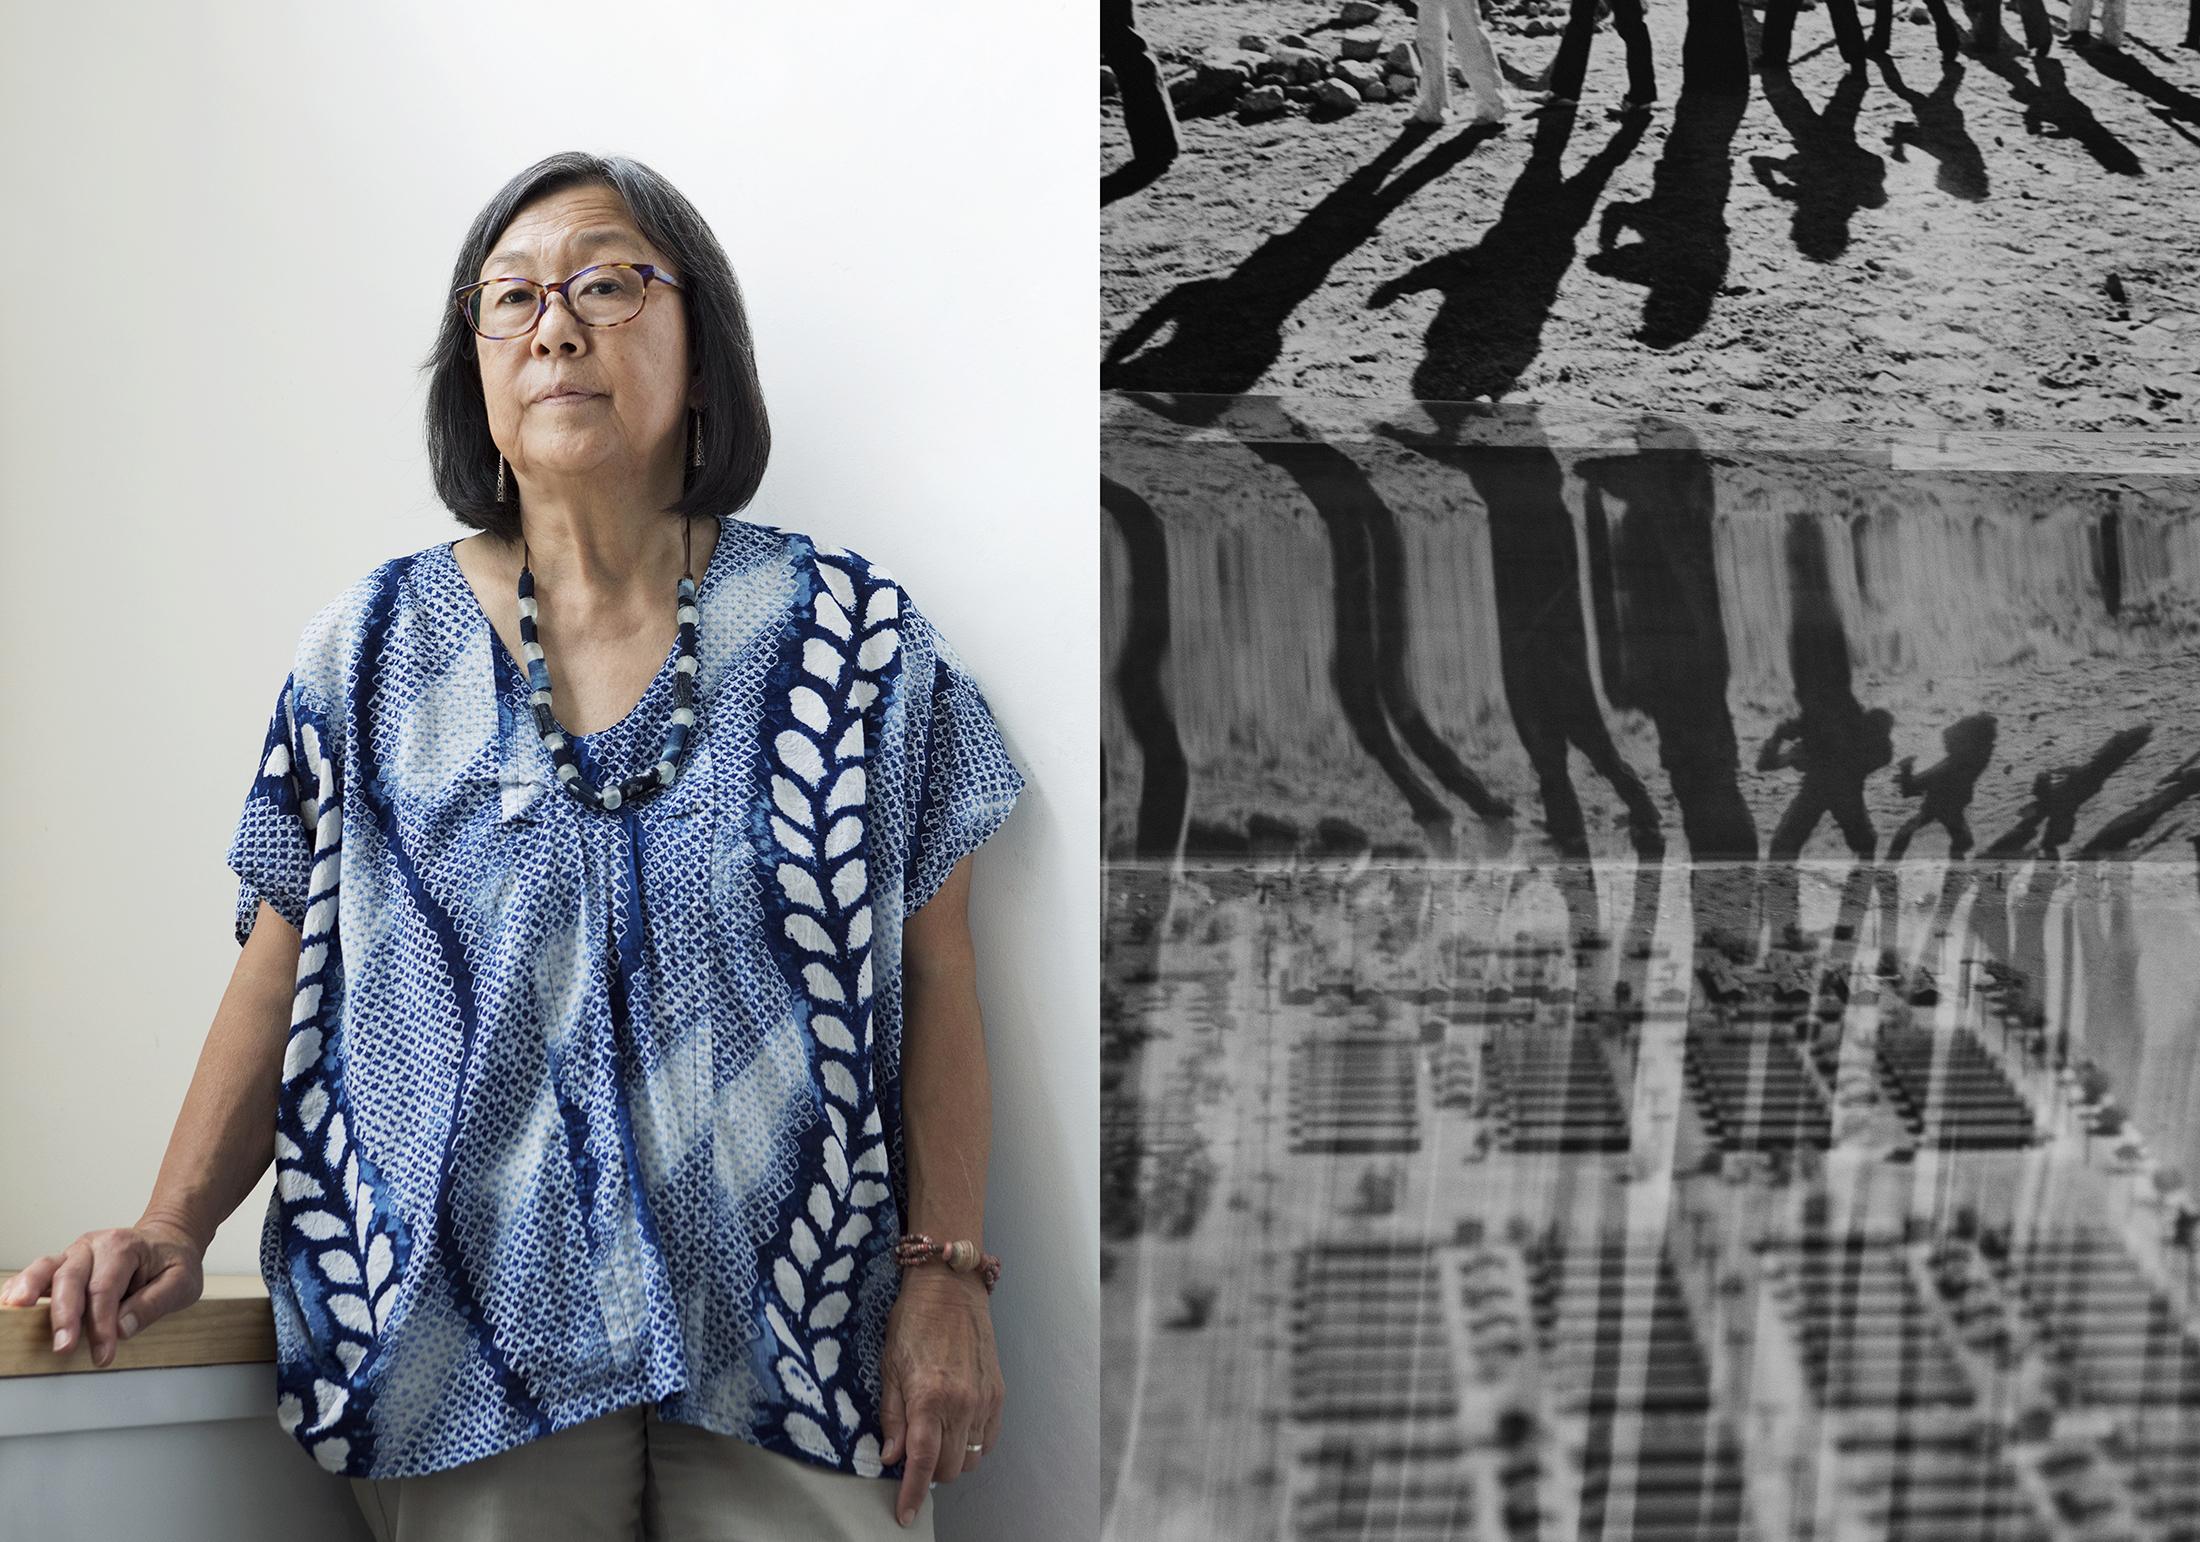 Kathy Masaoka | Photographed by Zen Sekizawa